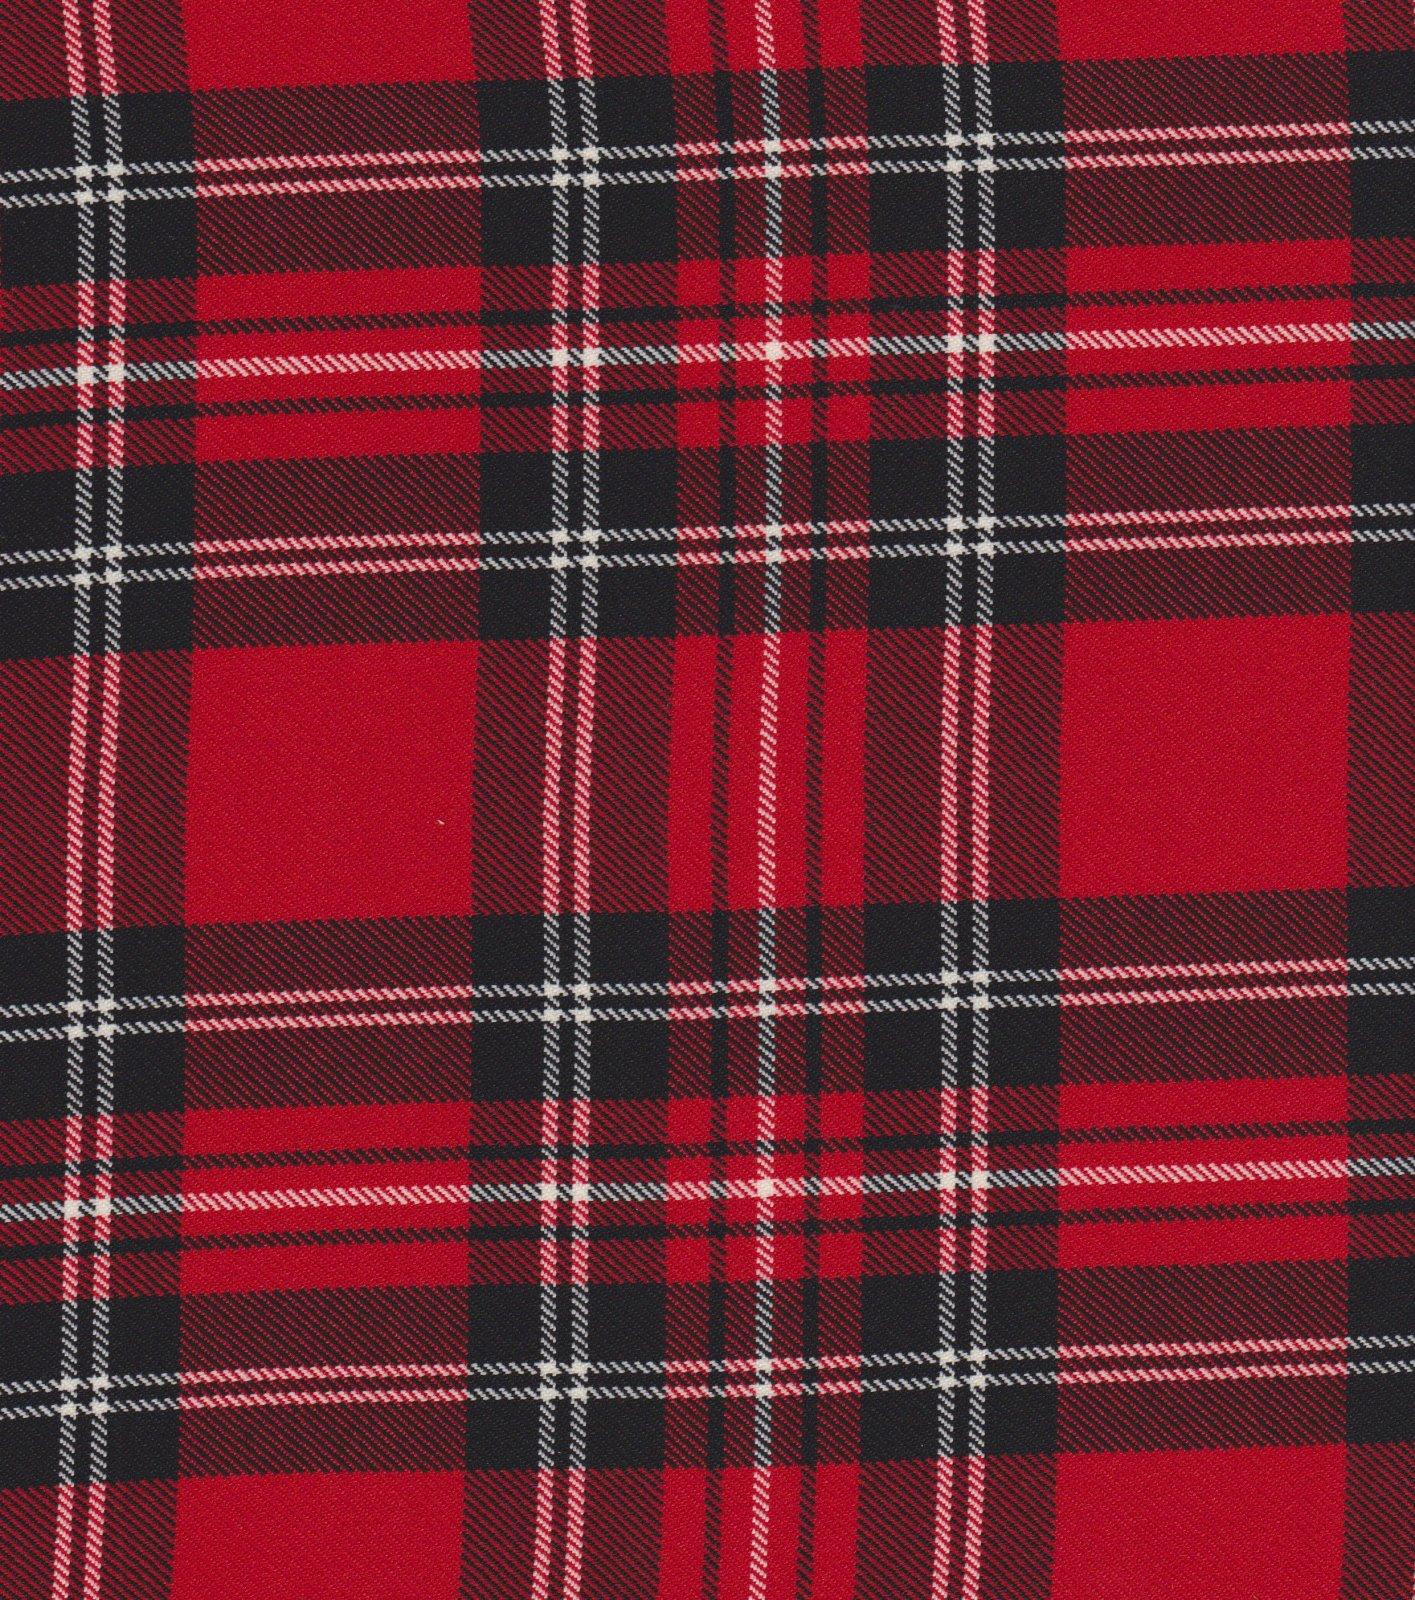 FT-Scottish Tartan Plaid NWR/NRC Red